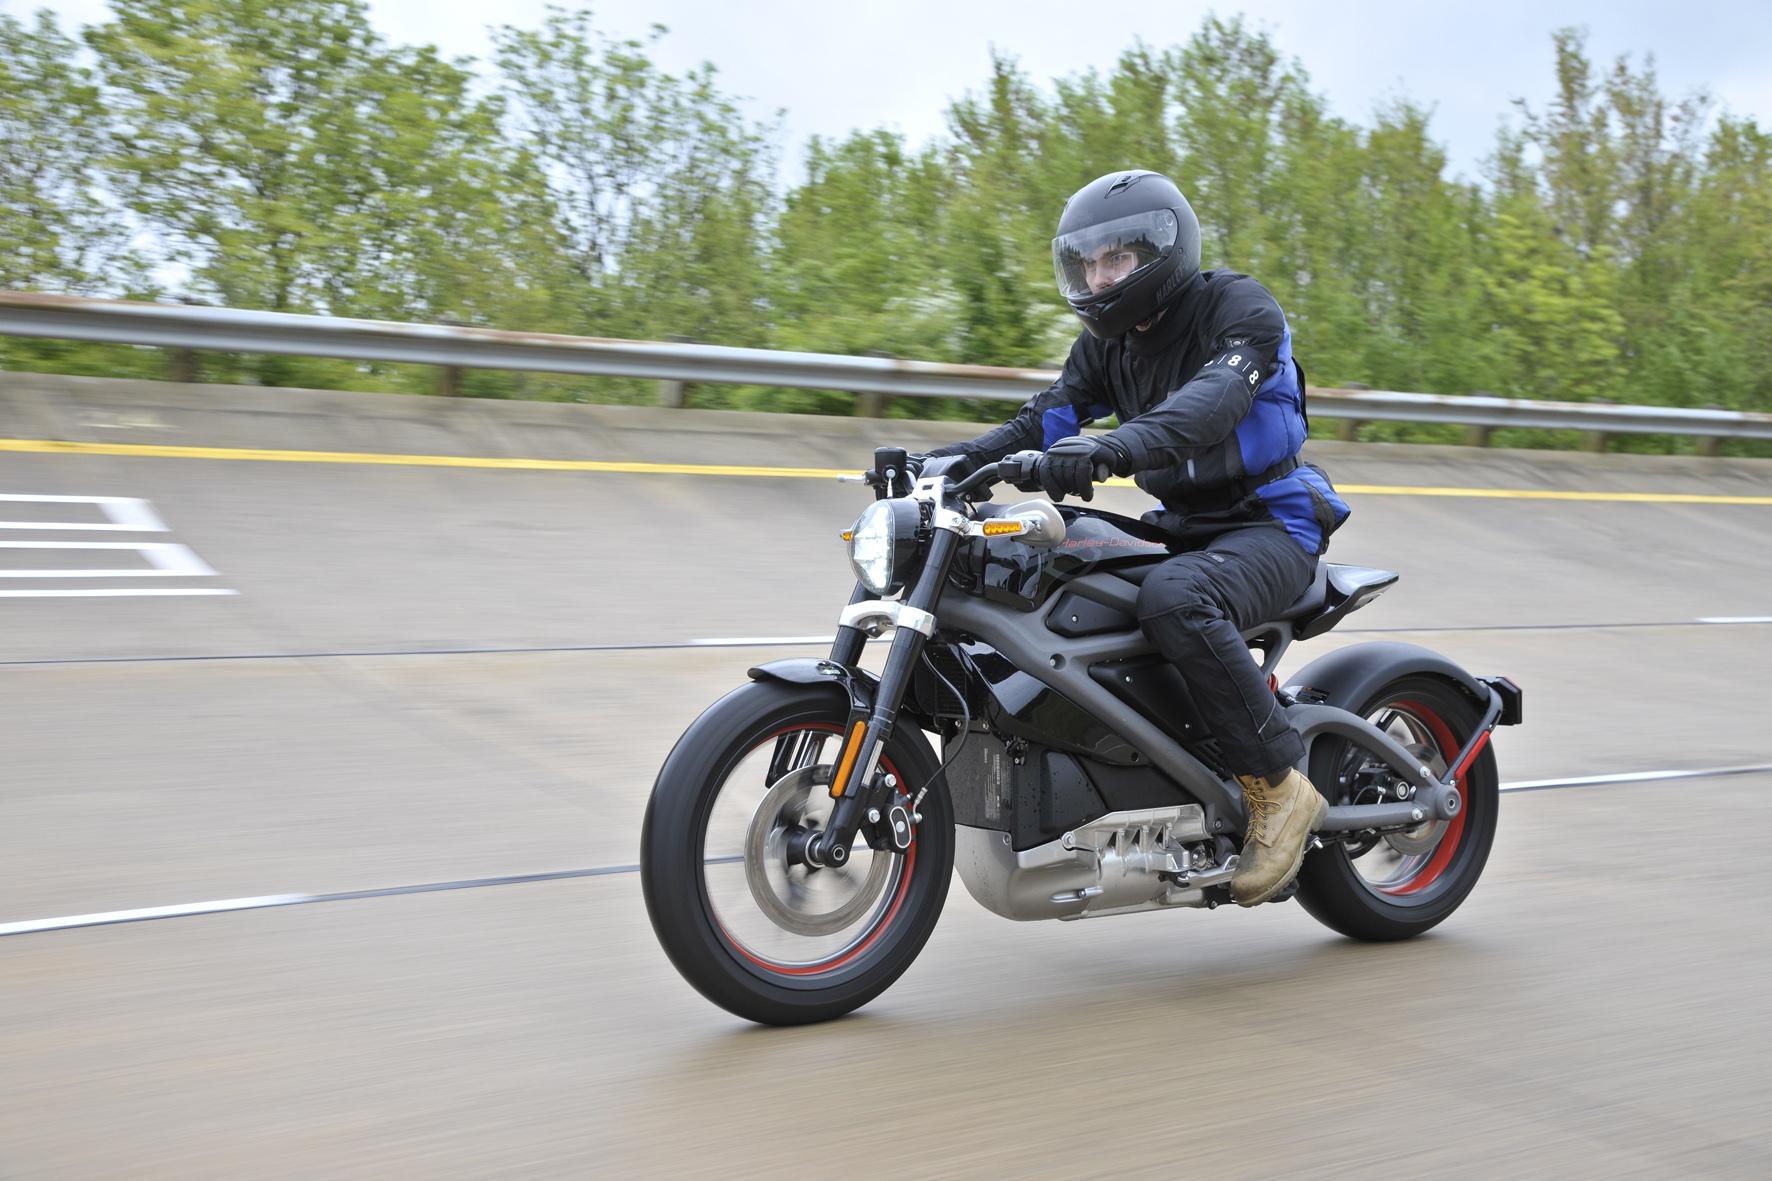 2015 Harley-Davidson Project Livewire